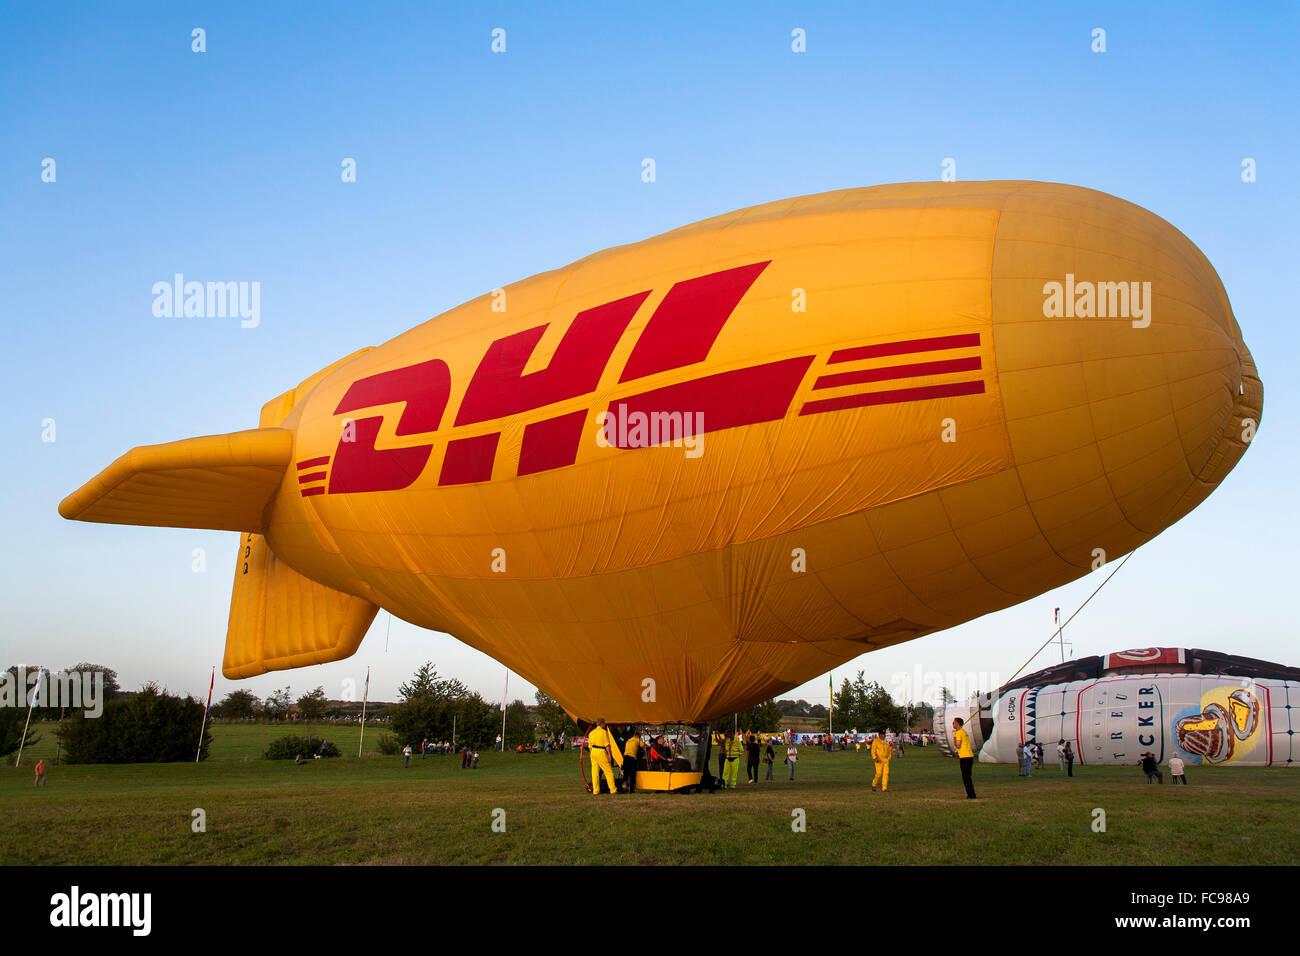 DEU, Germany, Sauerland region, Warstein, international balloon festival in Warstein, blimp of DHL [the balloon - Stock Image